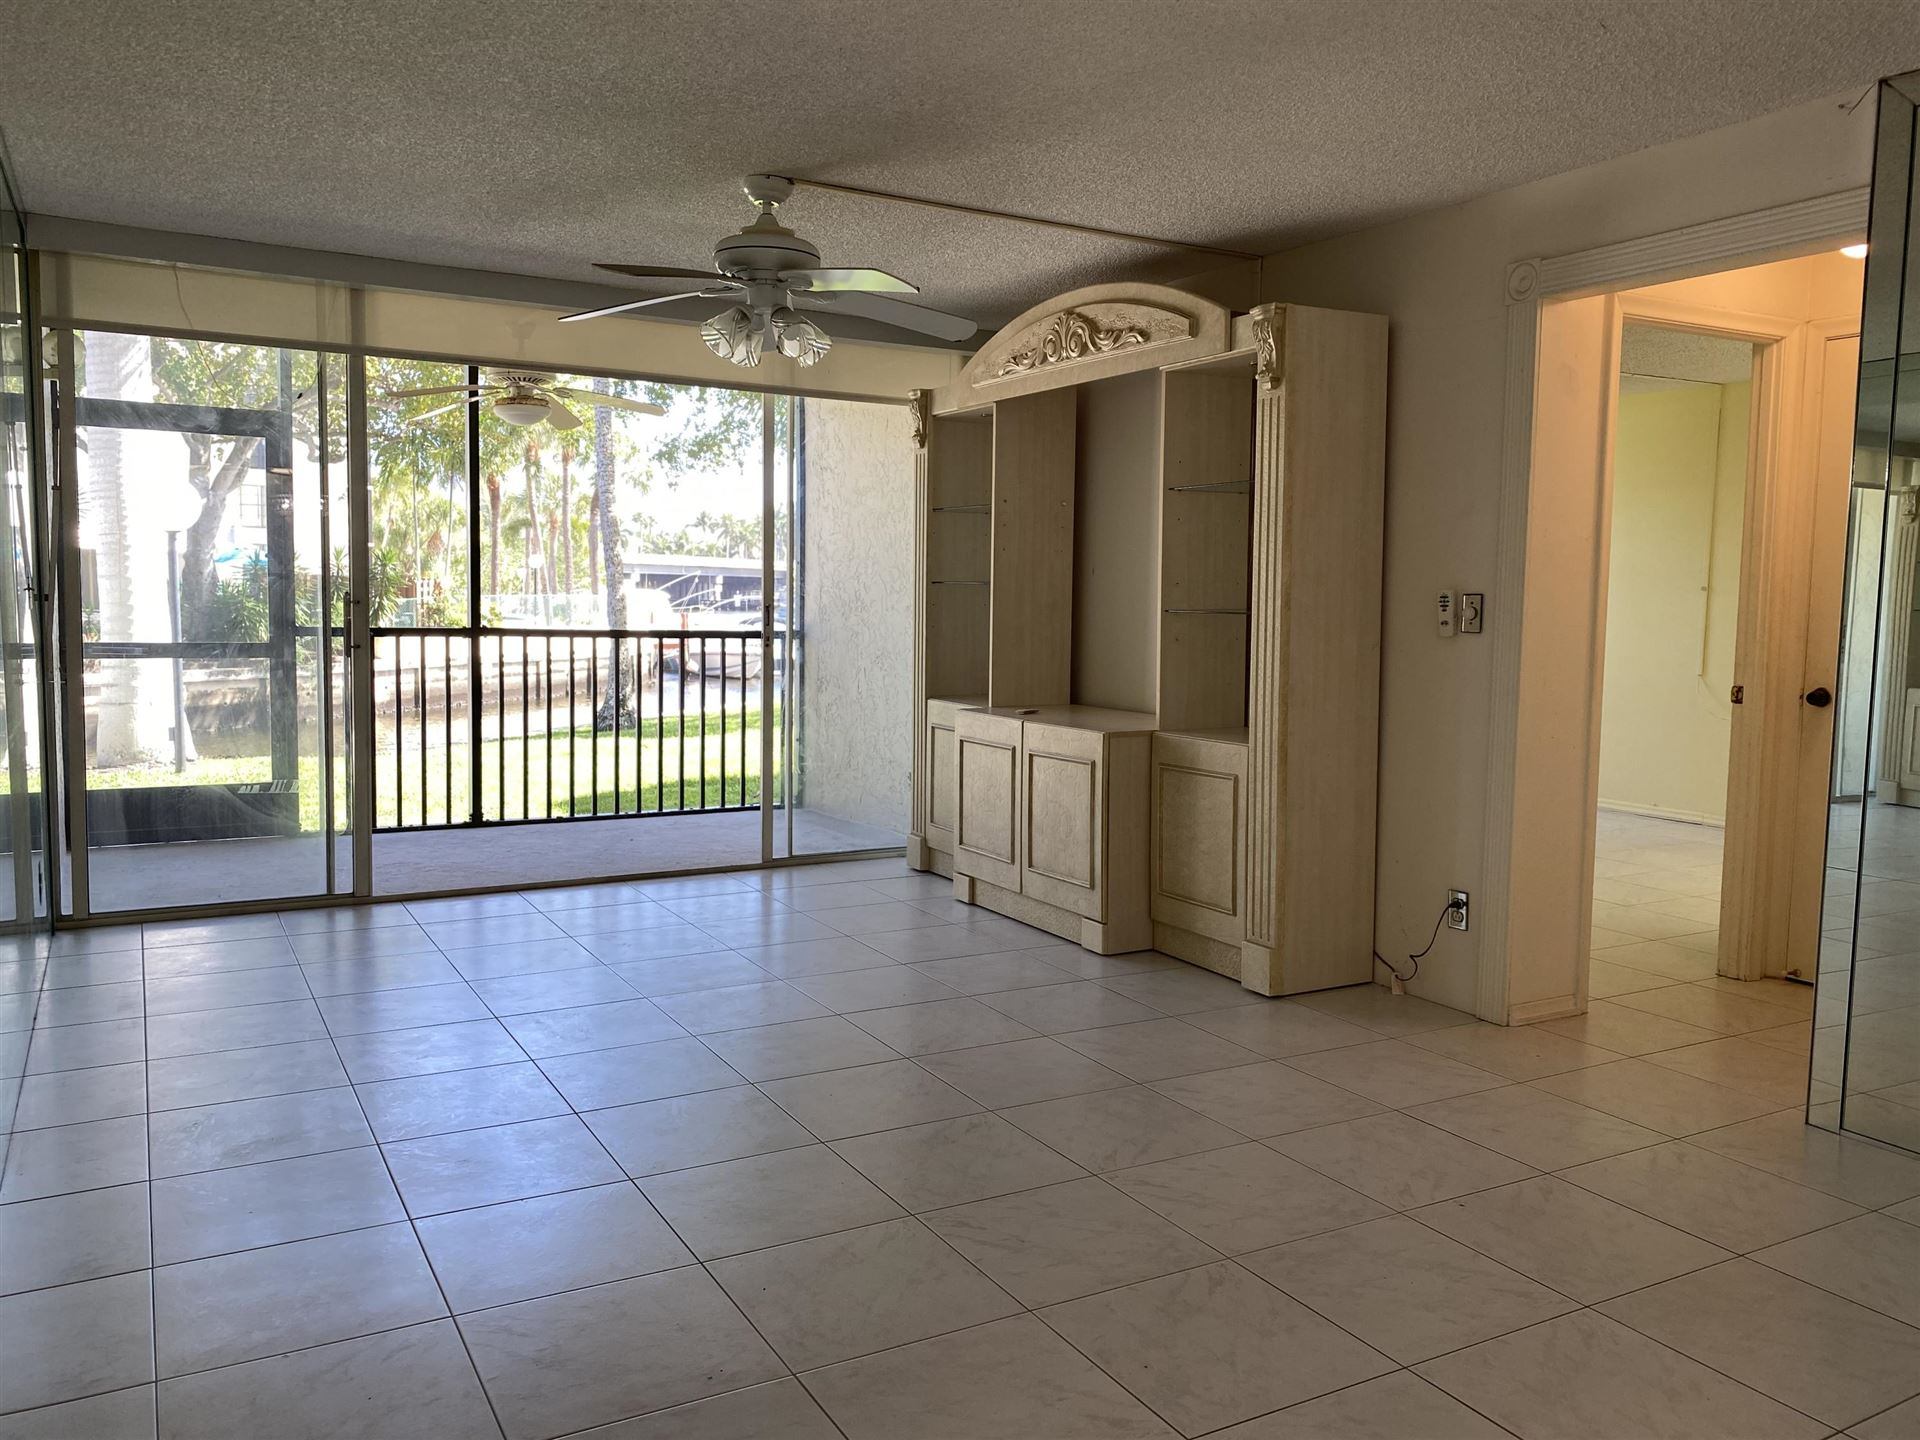 Photo of 7 Royal Palm Way #102, Boca Raton, FL 33432 (MLS # RX-10696372)